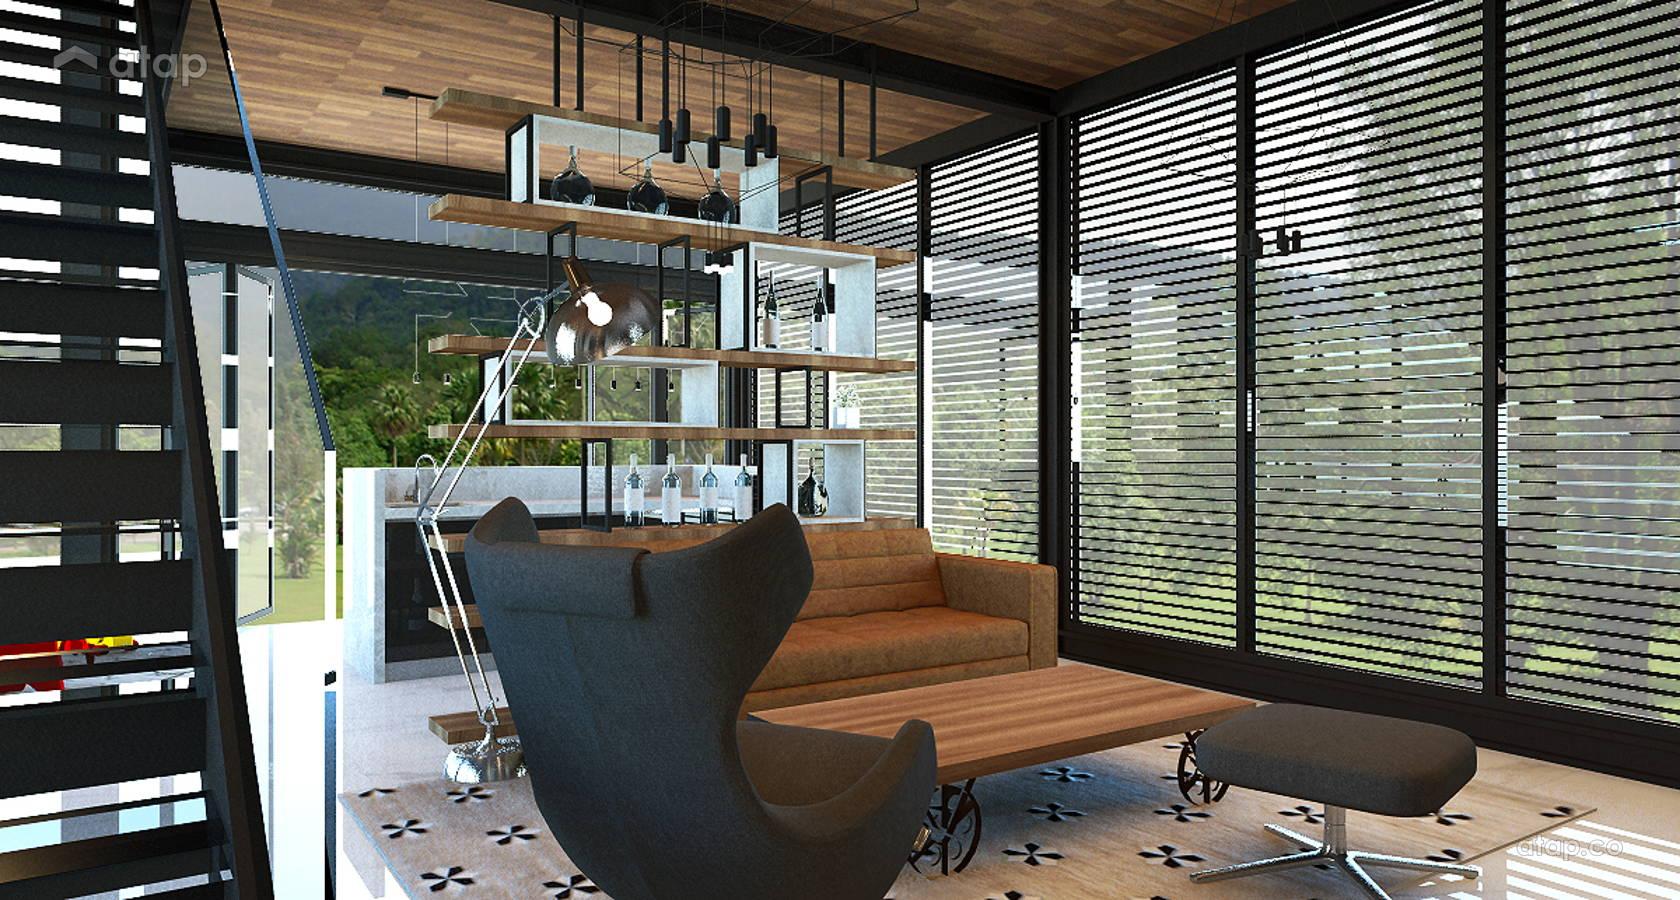 glass house interior design. 1  22 Kinrara Residences Glass House architectural interior design